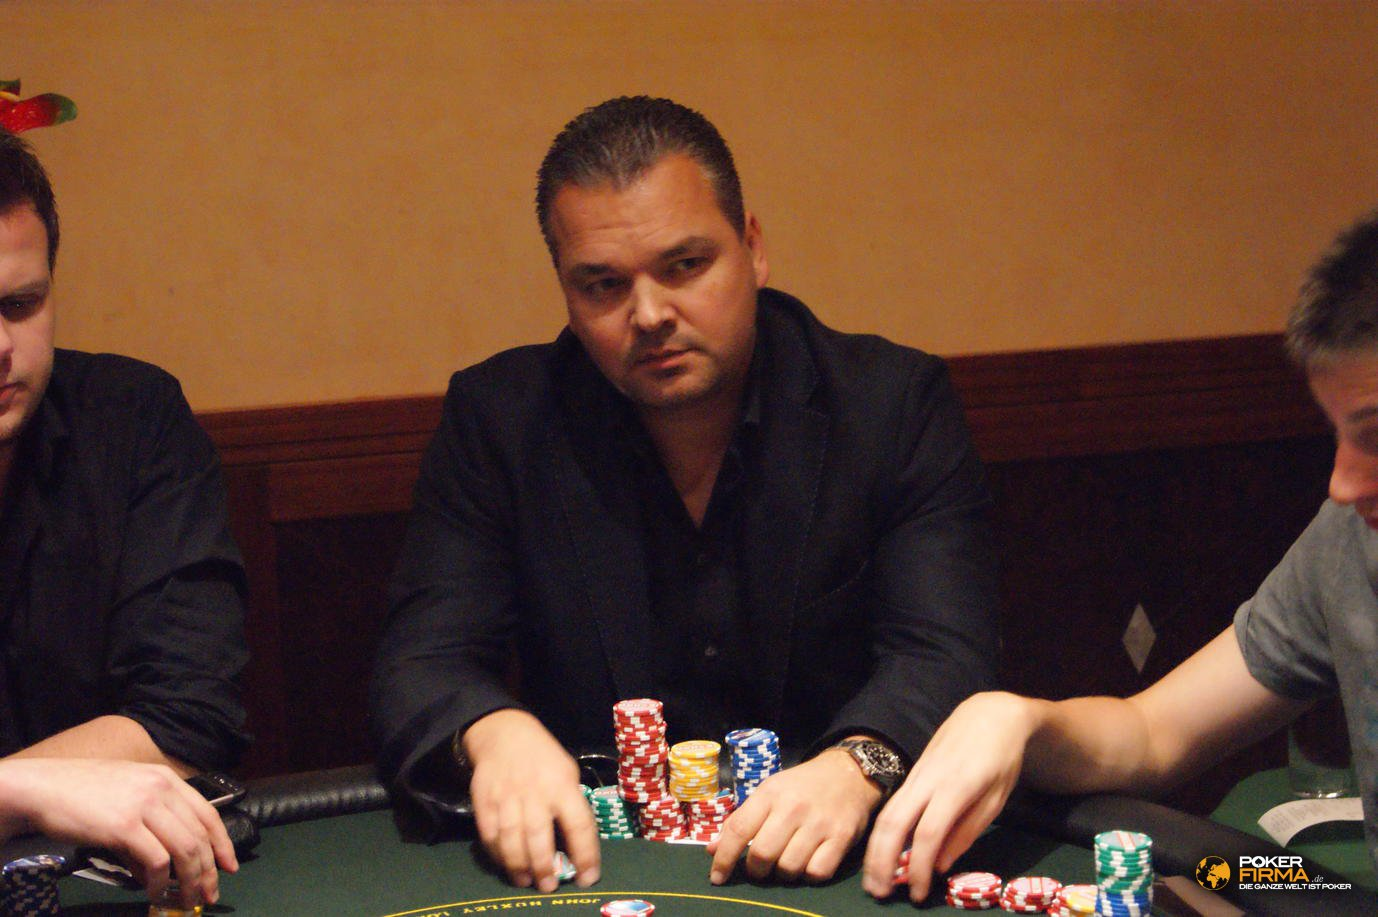 Poker_EM_2000_NLH_251011_Jan_Jachtmann